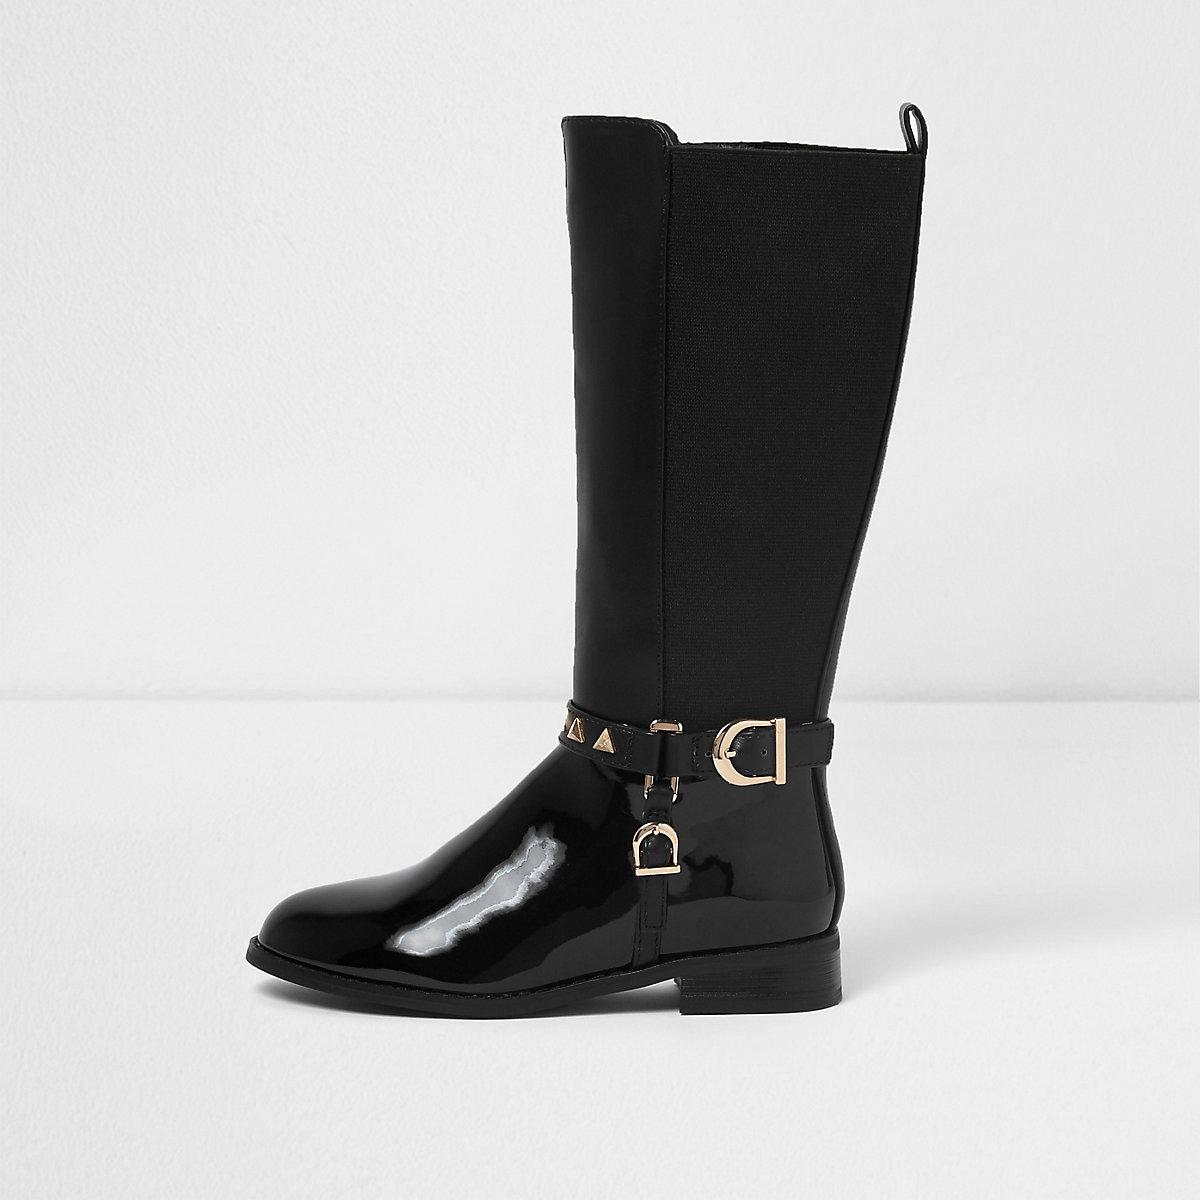 Girls black knee high studded riding boots